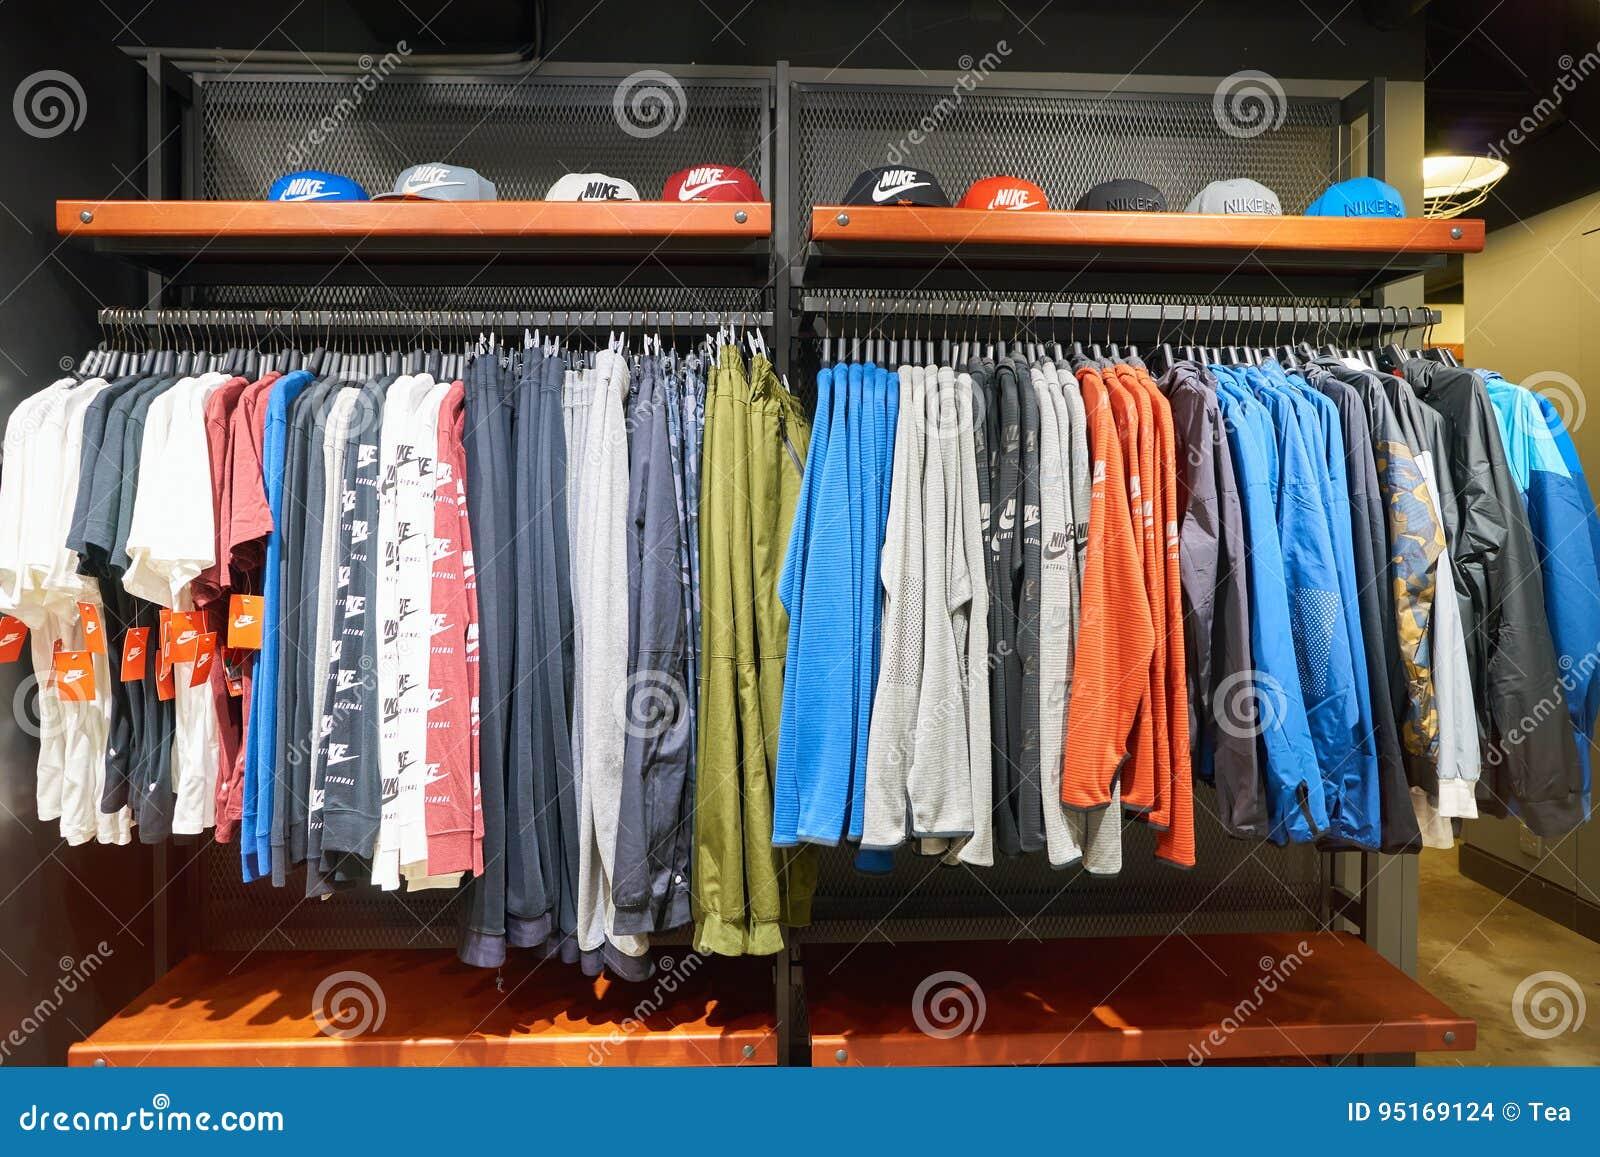 closet nike store